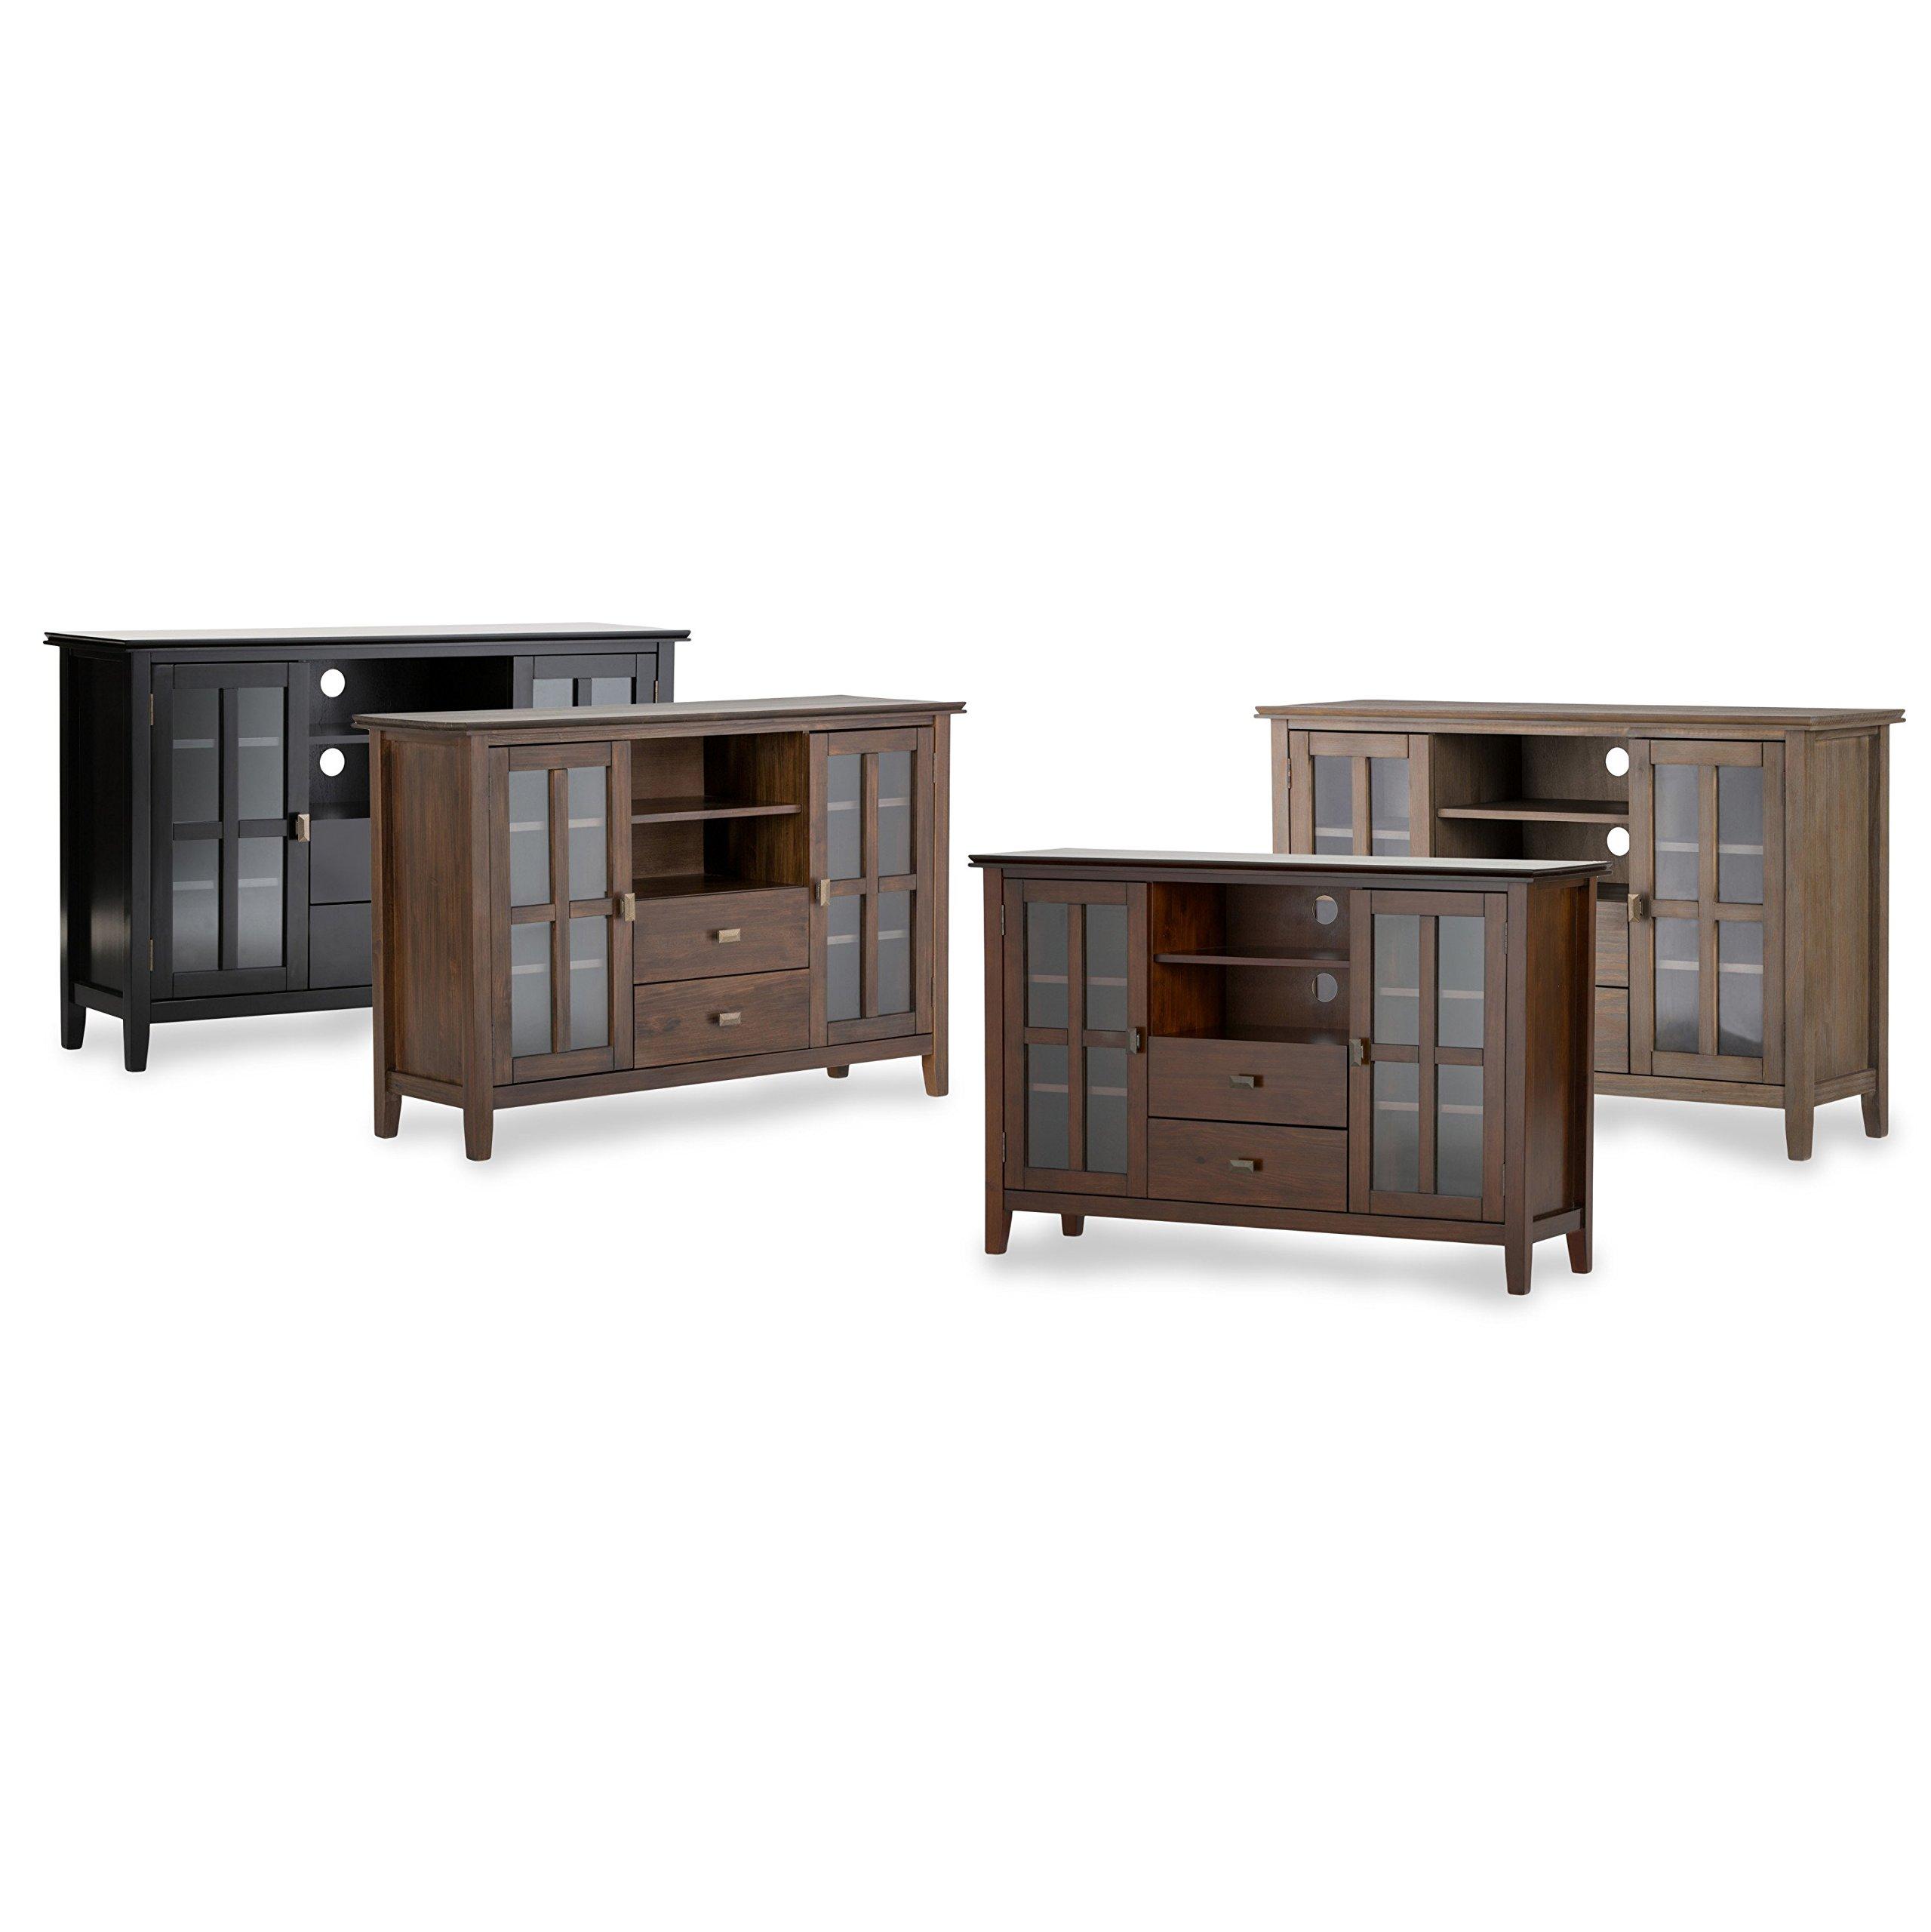 Simpli Home Artisan TV Media Stand for TVs up to 60'', Medium Auburn Brown by Simpli Home (Image #5)